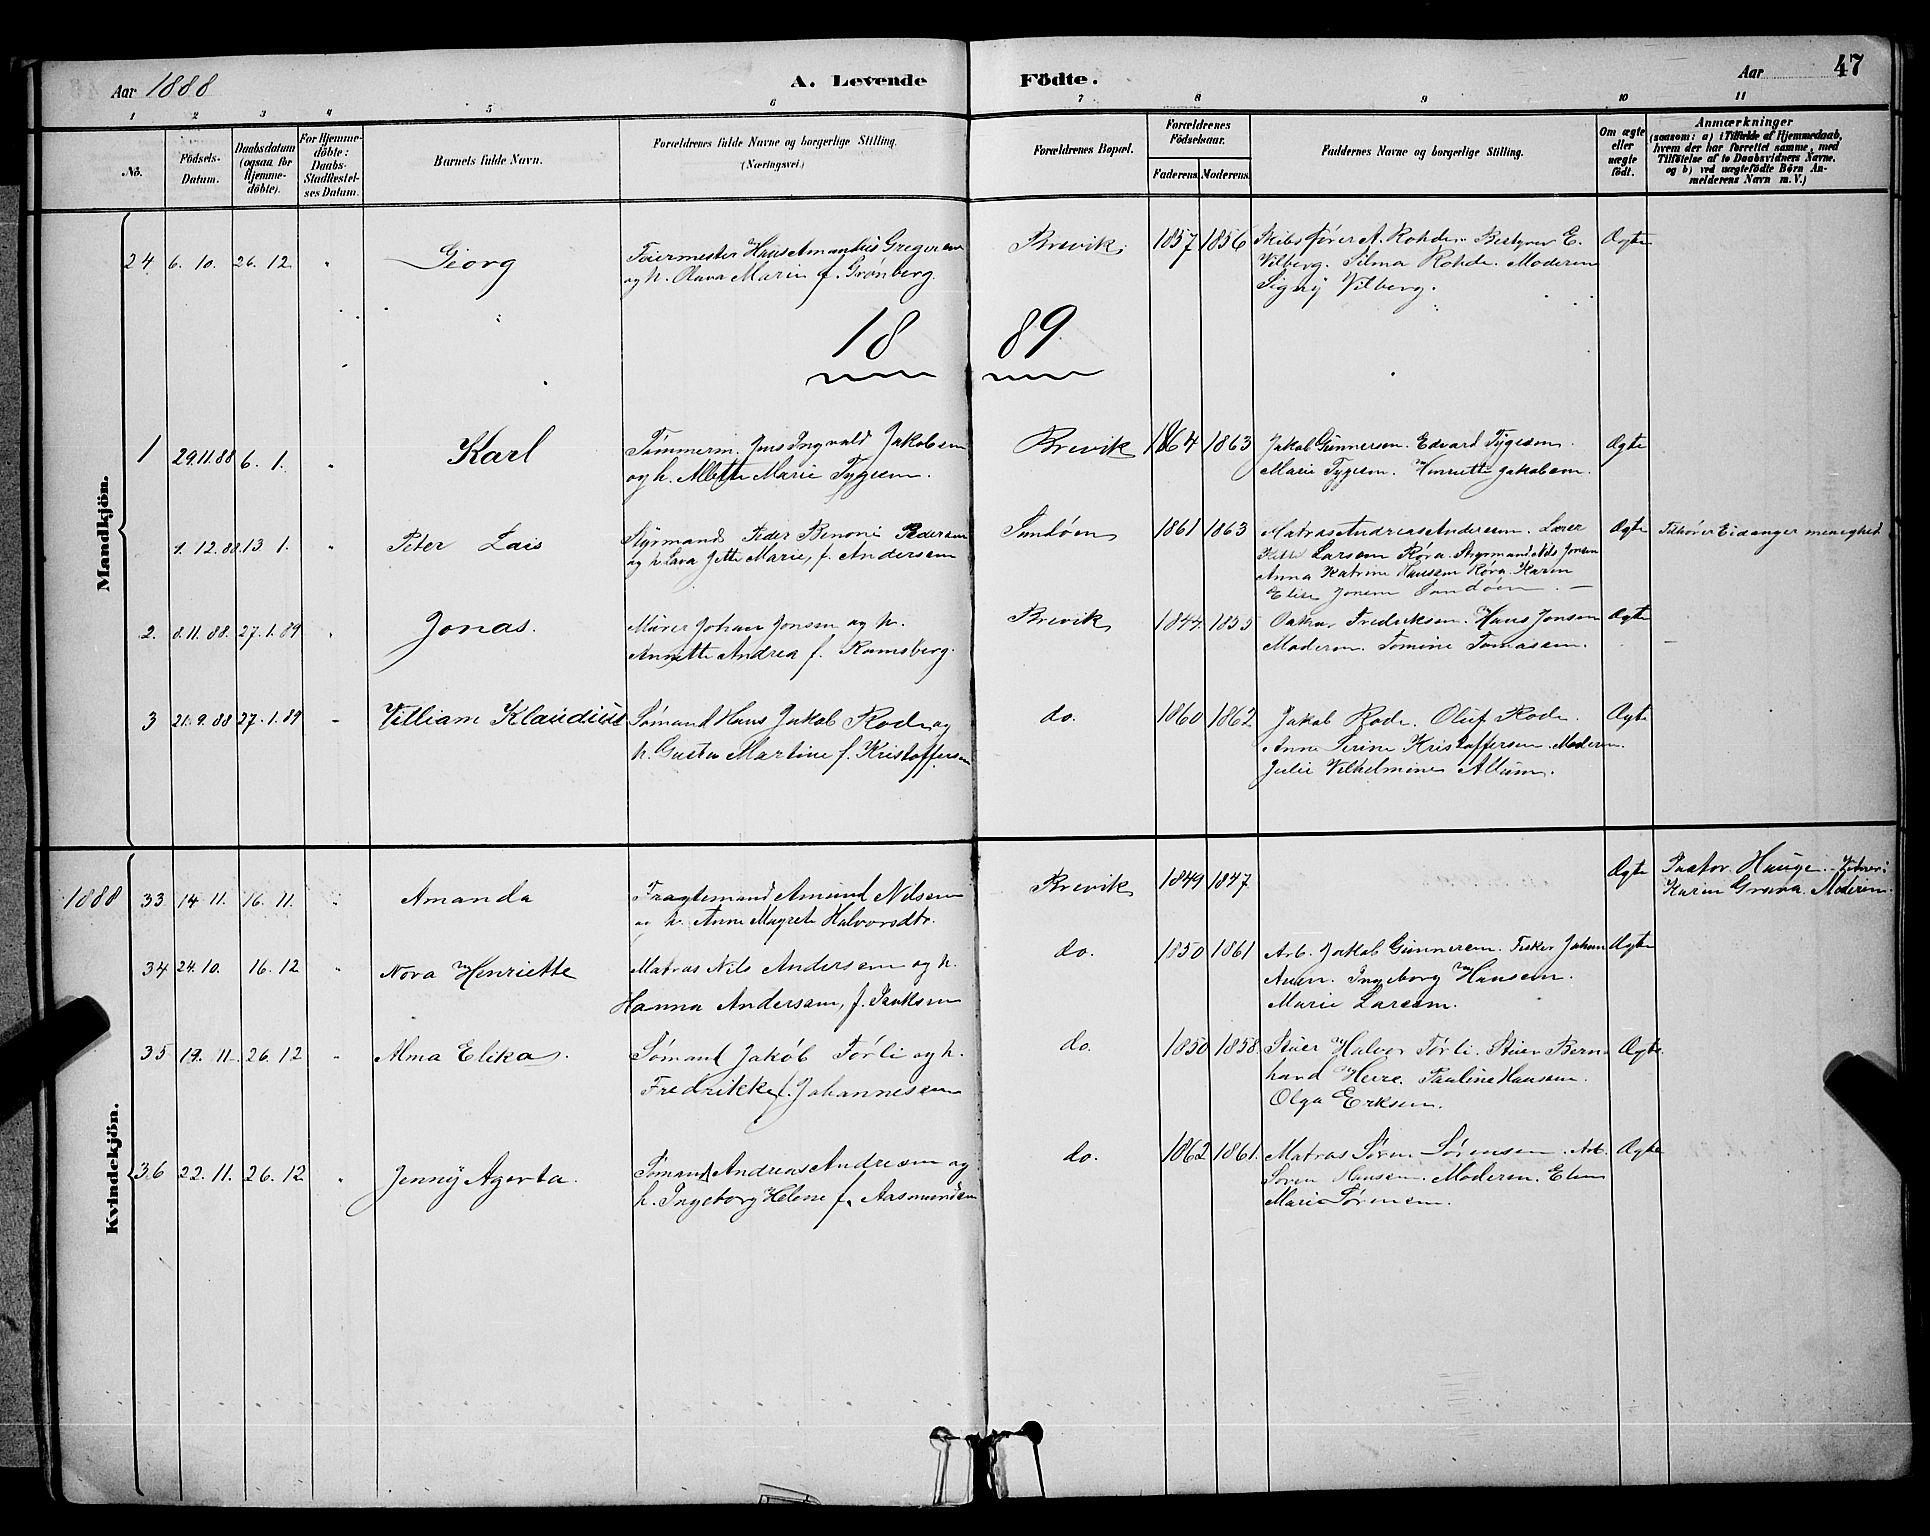 SAKO, Brevik kirkebøker, G/Ga/L0004: Klokkerbok nr. 4, 1882-1900, s. 47